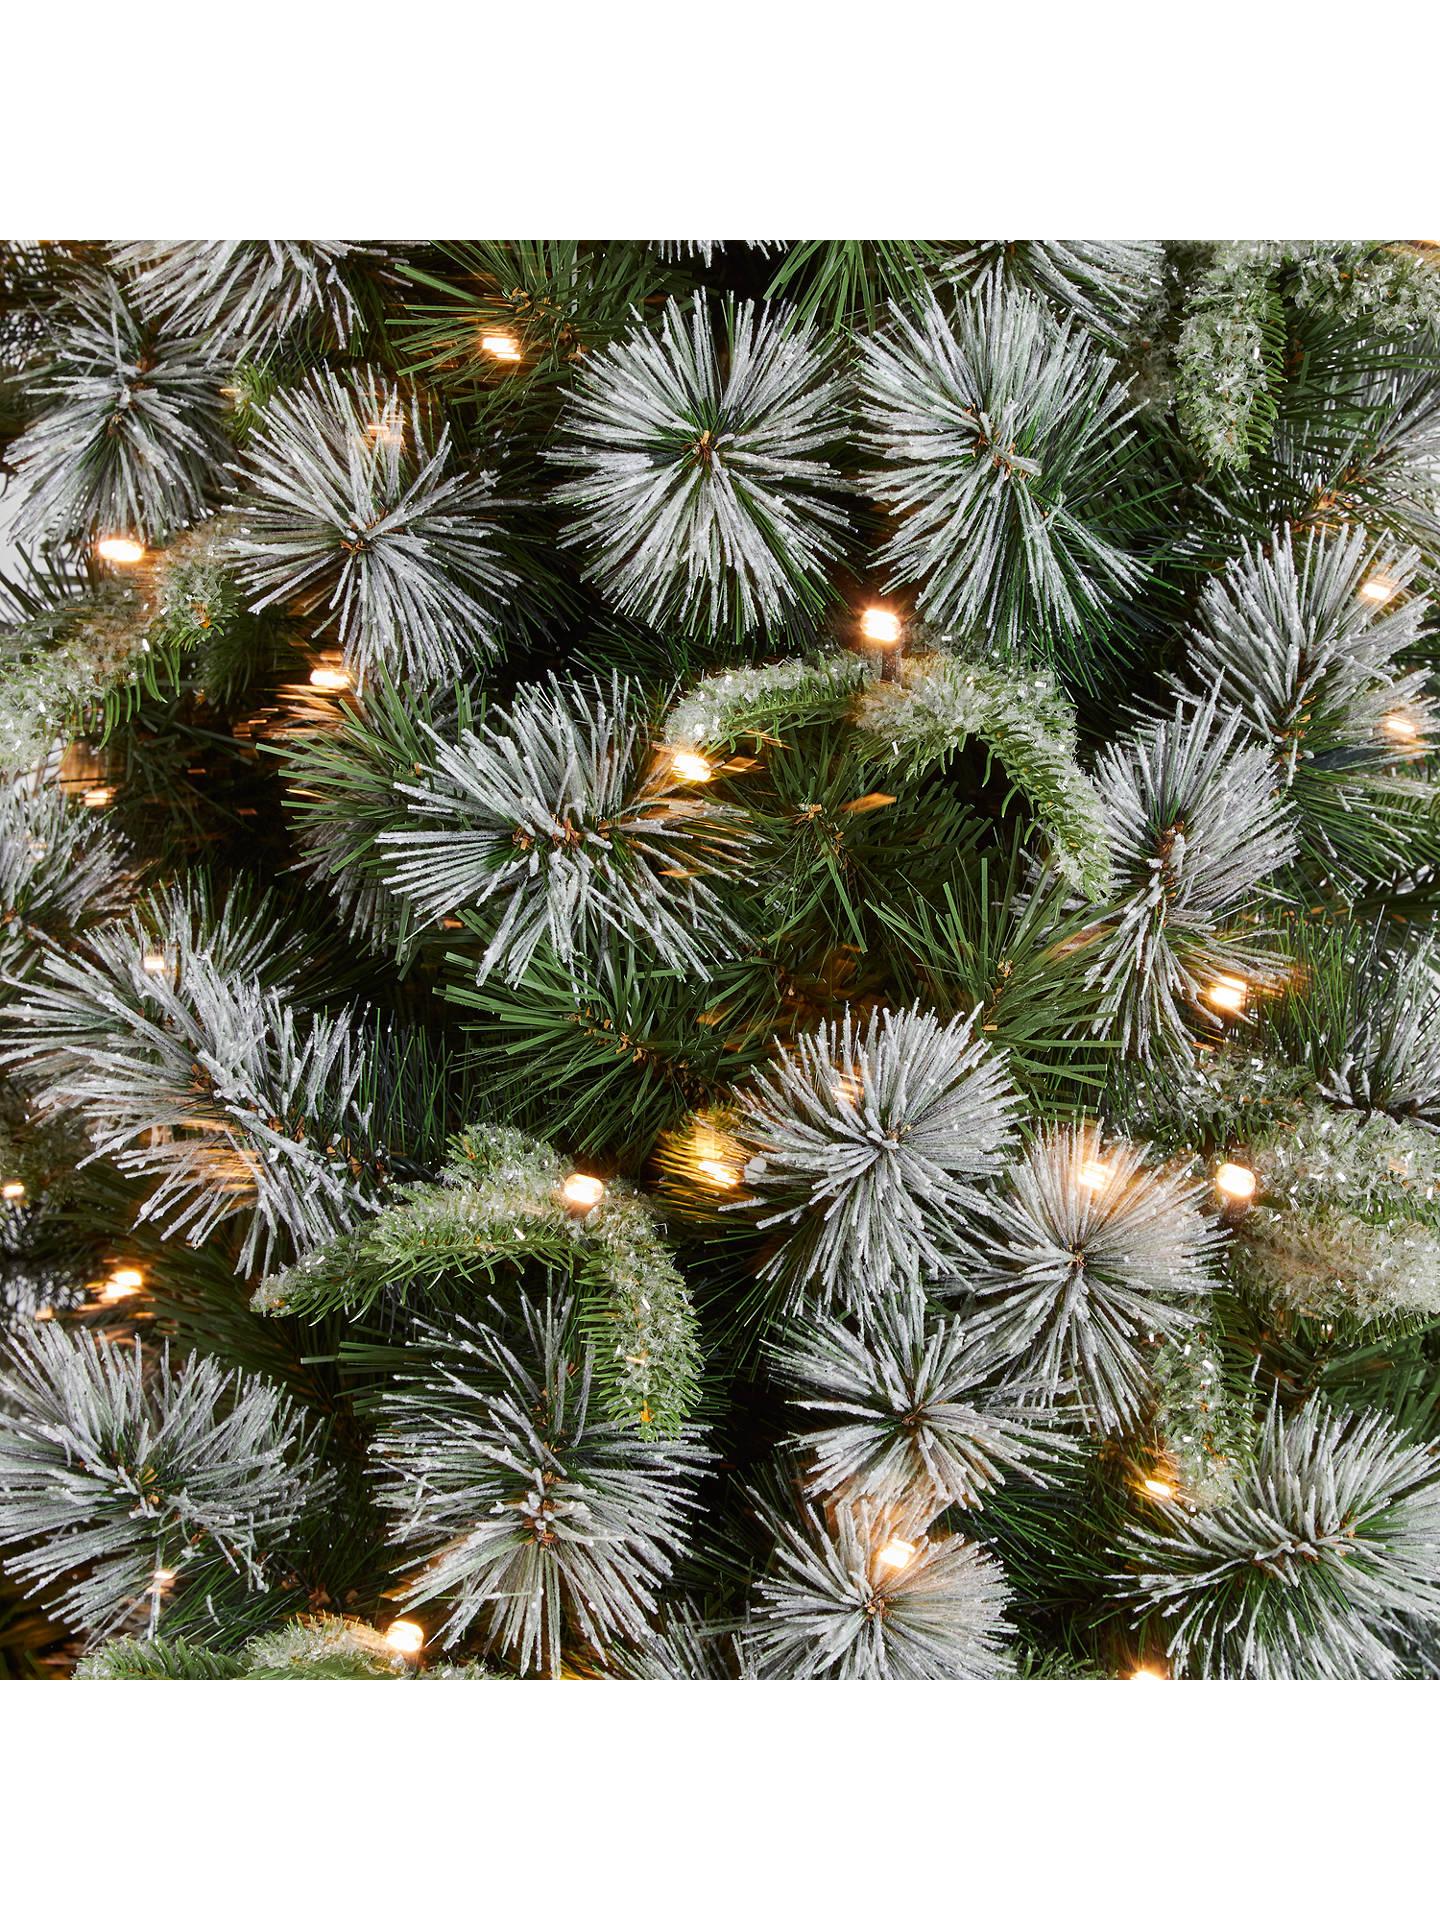 John Lewis & Partners St. Anton Potted Pre-lit Christmas Tree, 6ft at John Lewis & Partners